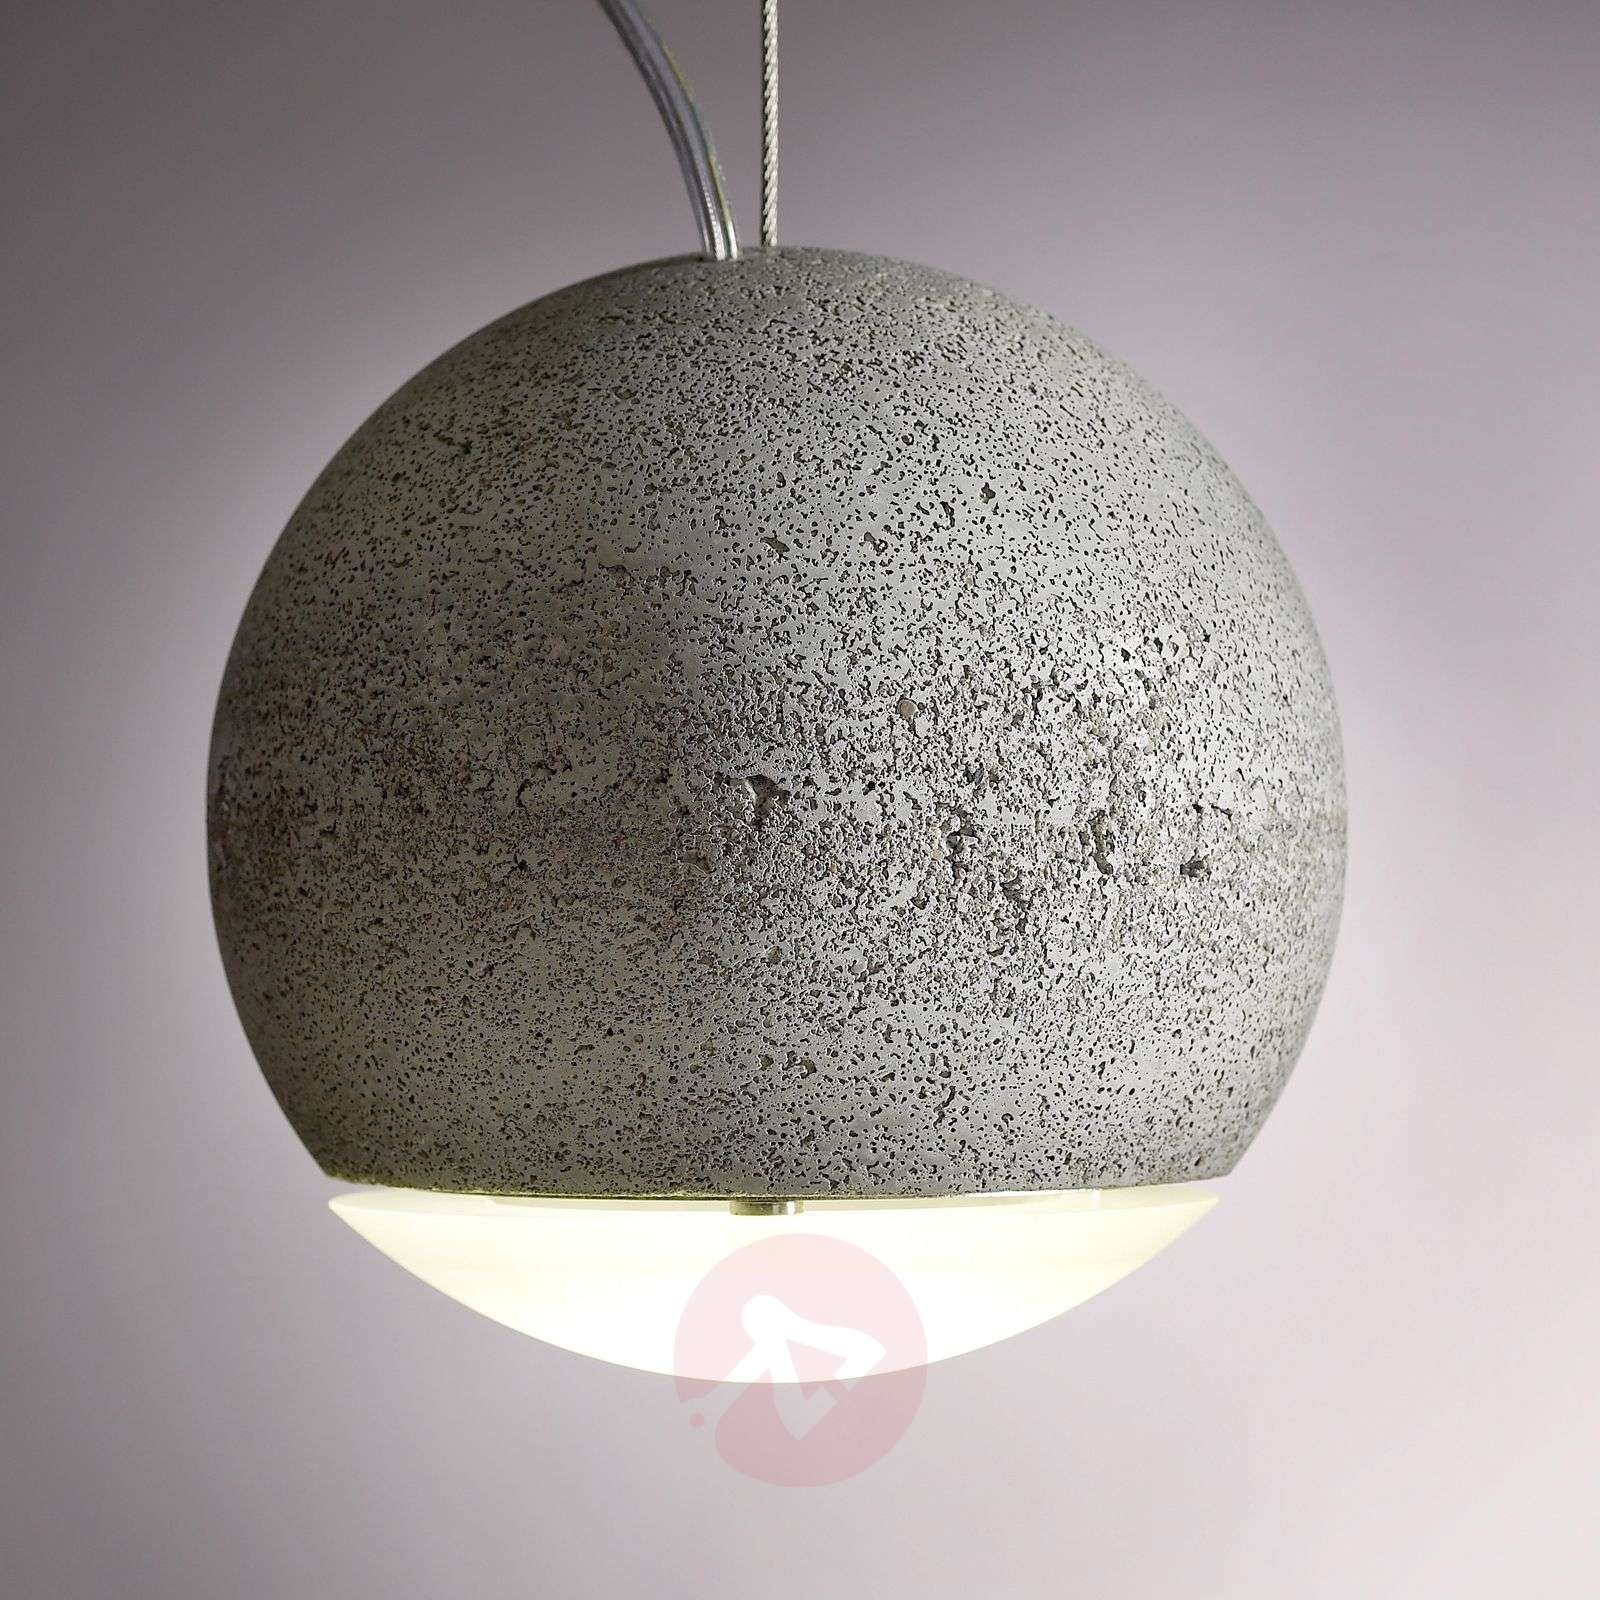 Hanging light TRABANT, 16 cm-9030101X-01